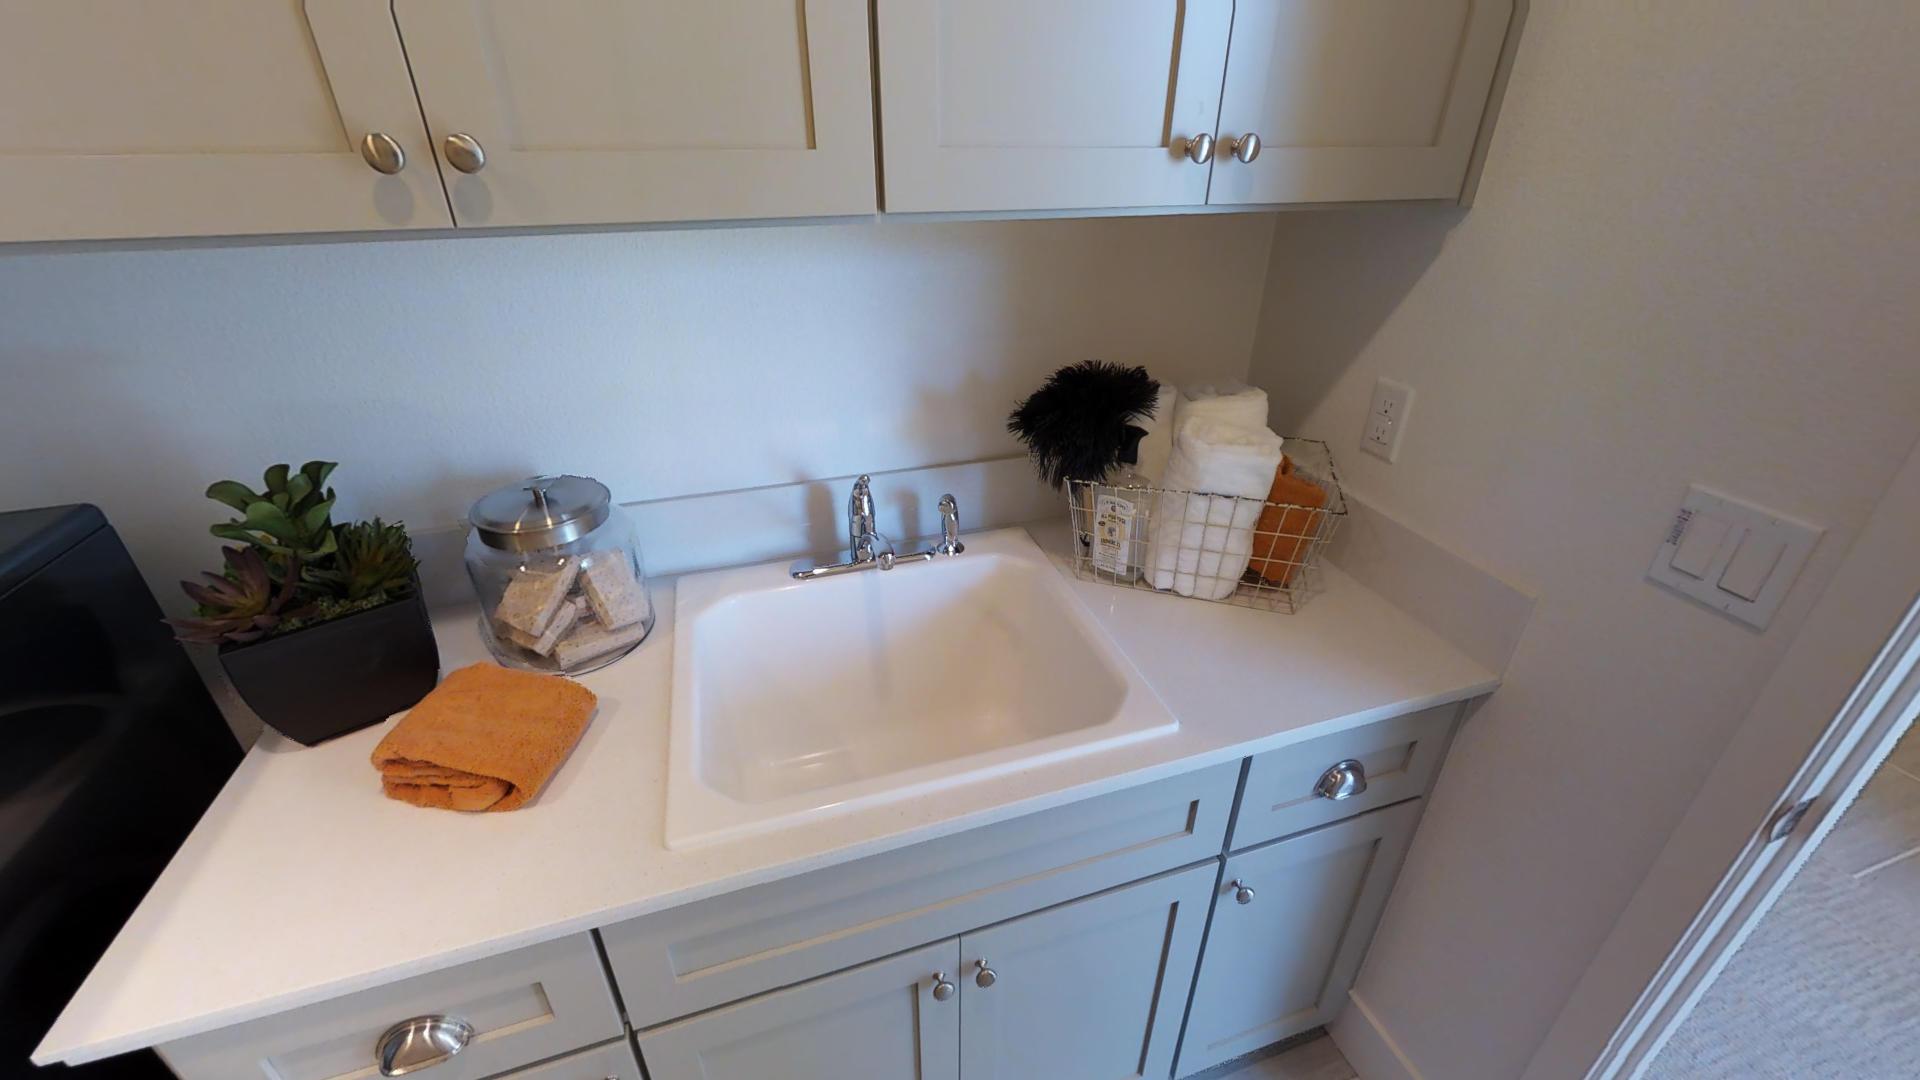 Ashford at Mountain House Plan 1 Laundry Room